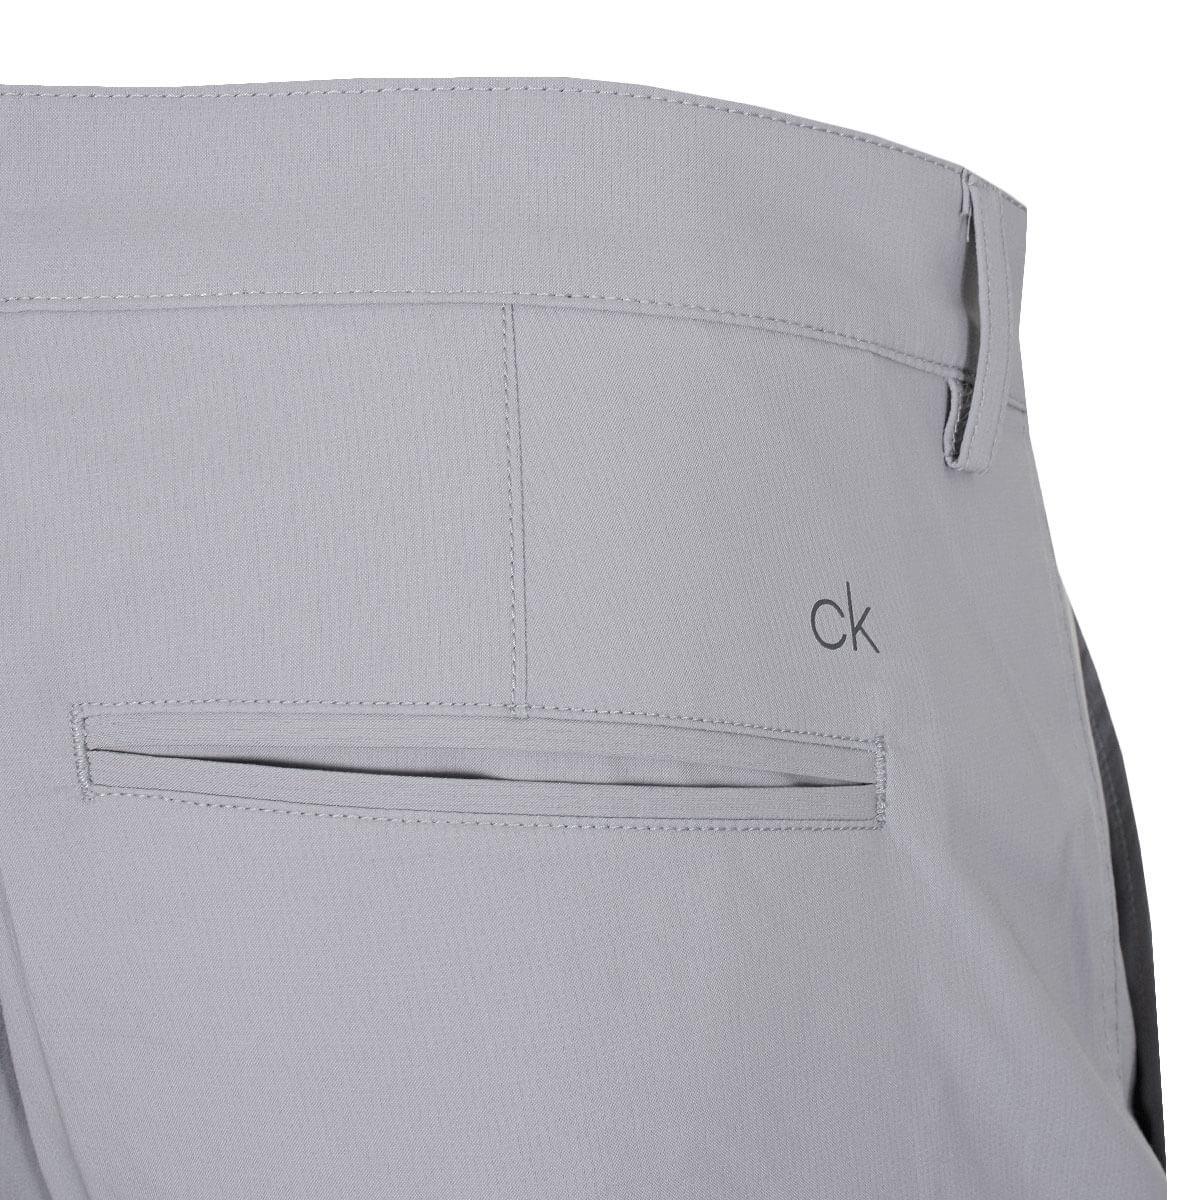 thumbnail 19 - Calvin Klein Mens 2021 Slim Fit Micro Tech Lightweight Golf Shorts 34% OFF RRP